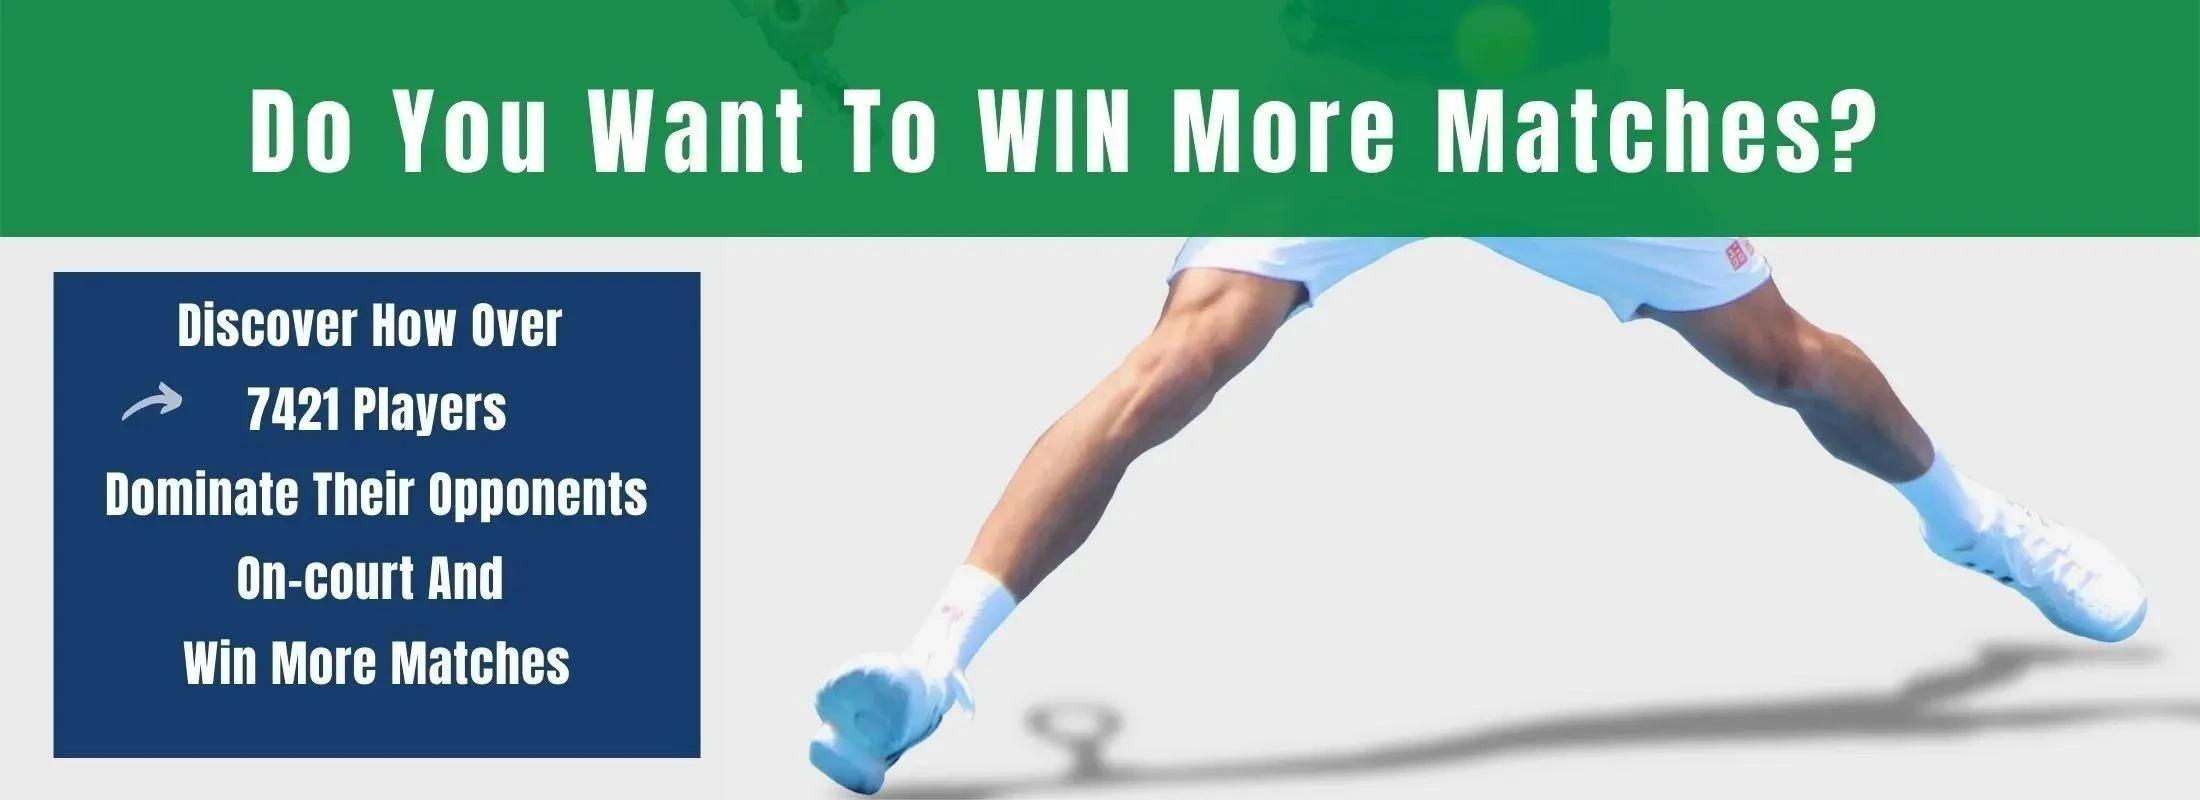 tennis-speed-agility-reaction-program